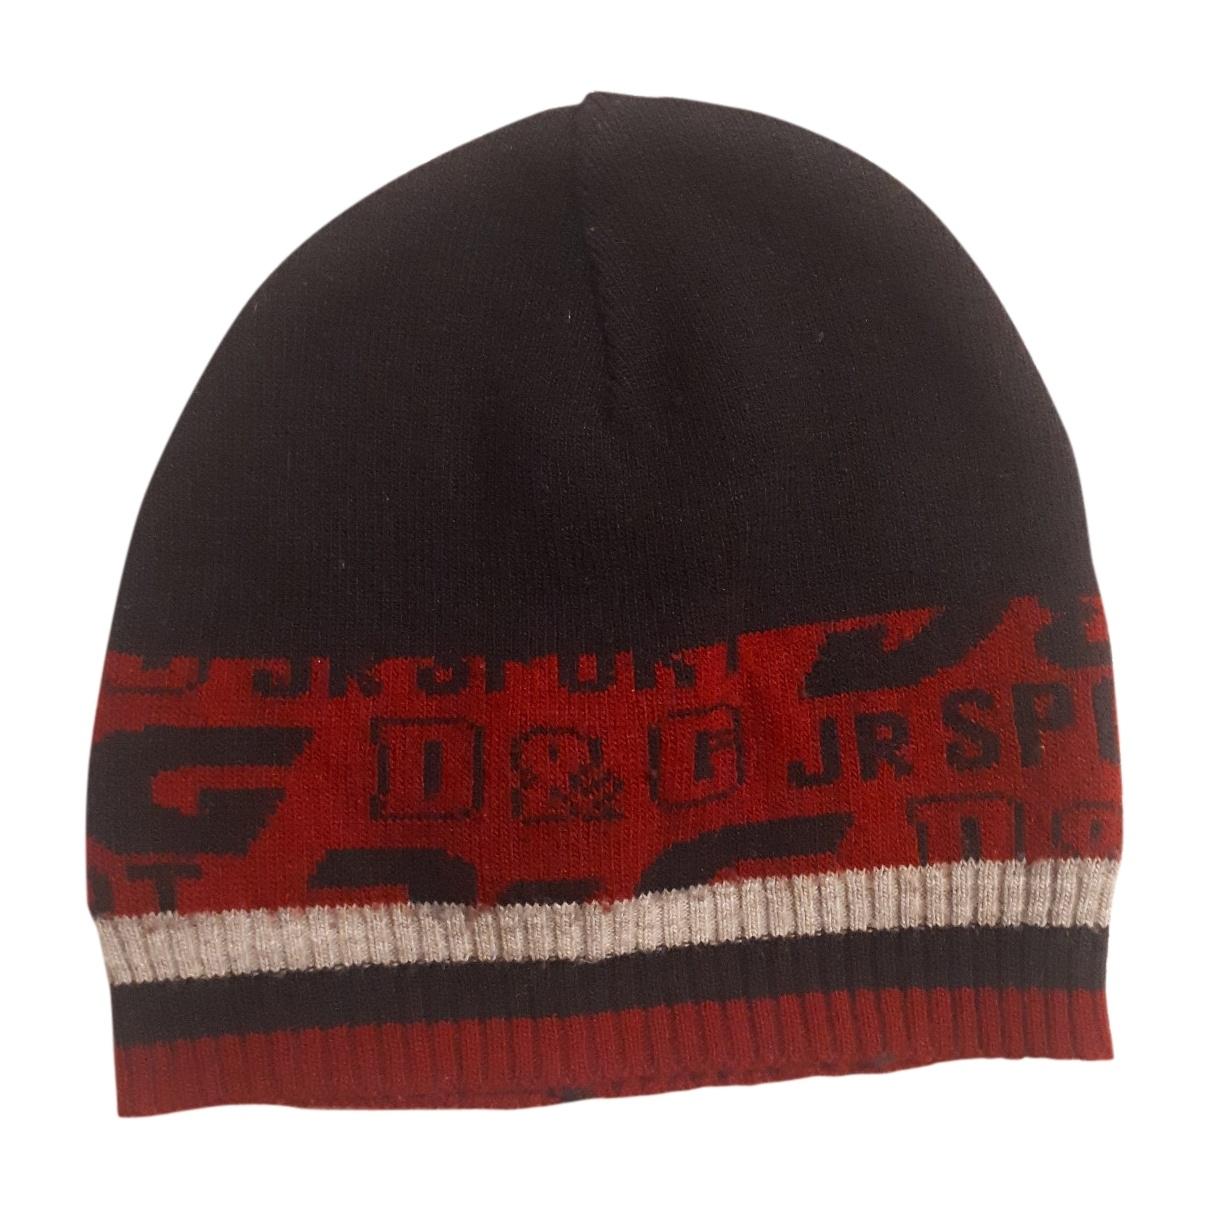 D&g \N Blue Wool hat & Gloves for Kids \N